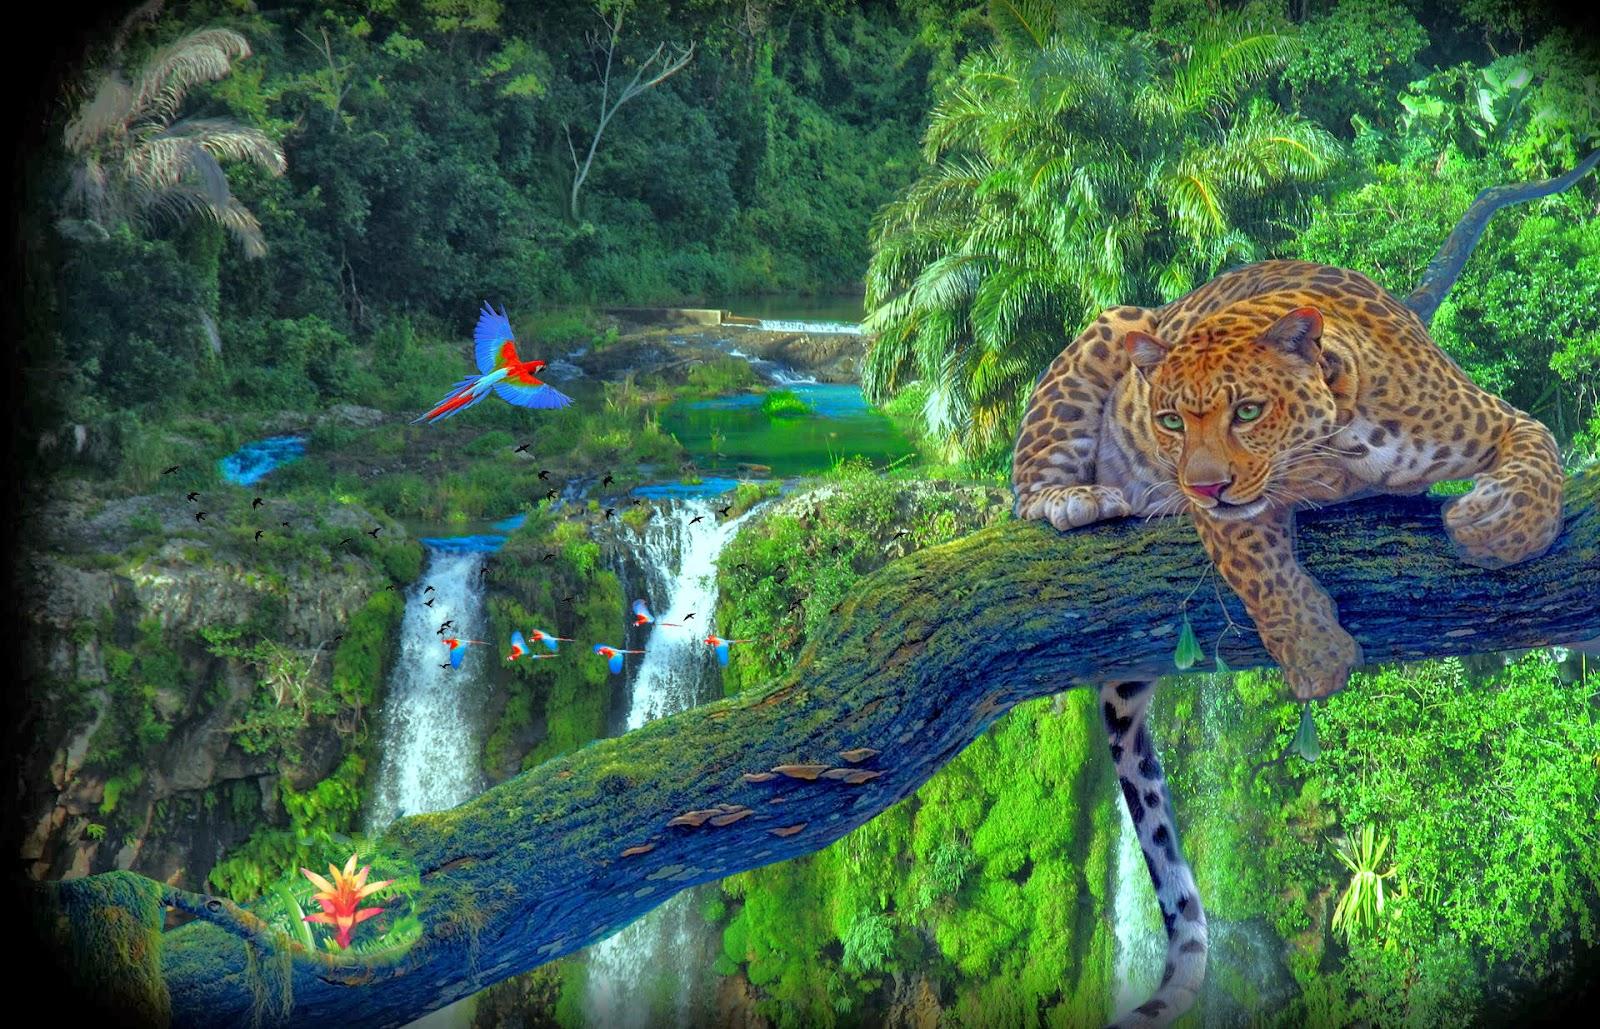 Image gallery hermosos y paisajes - Imagenes de paisajes ...